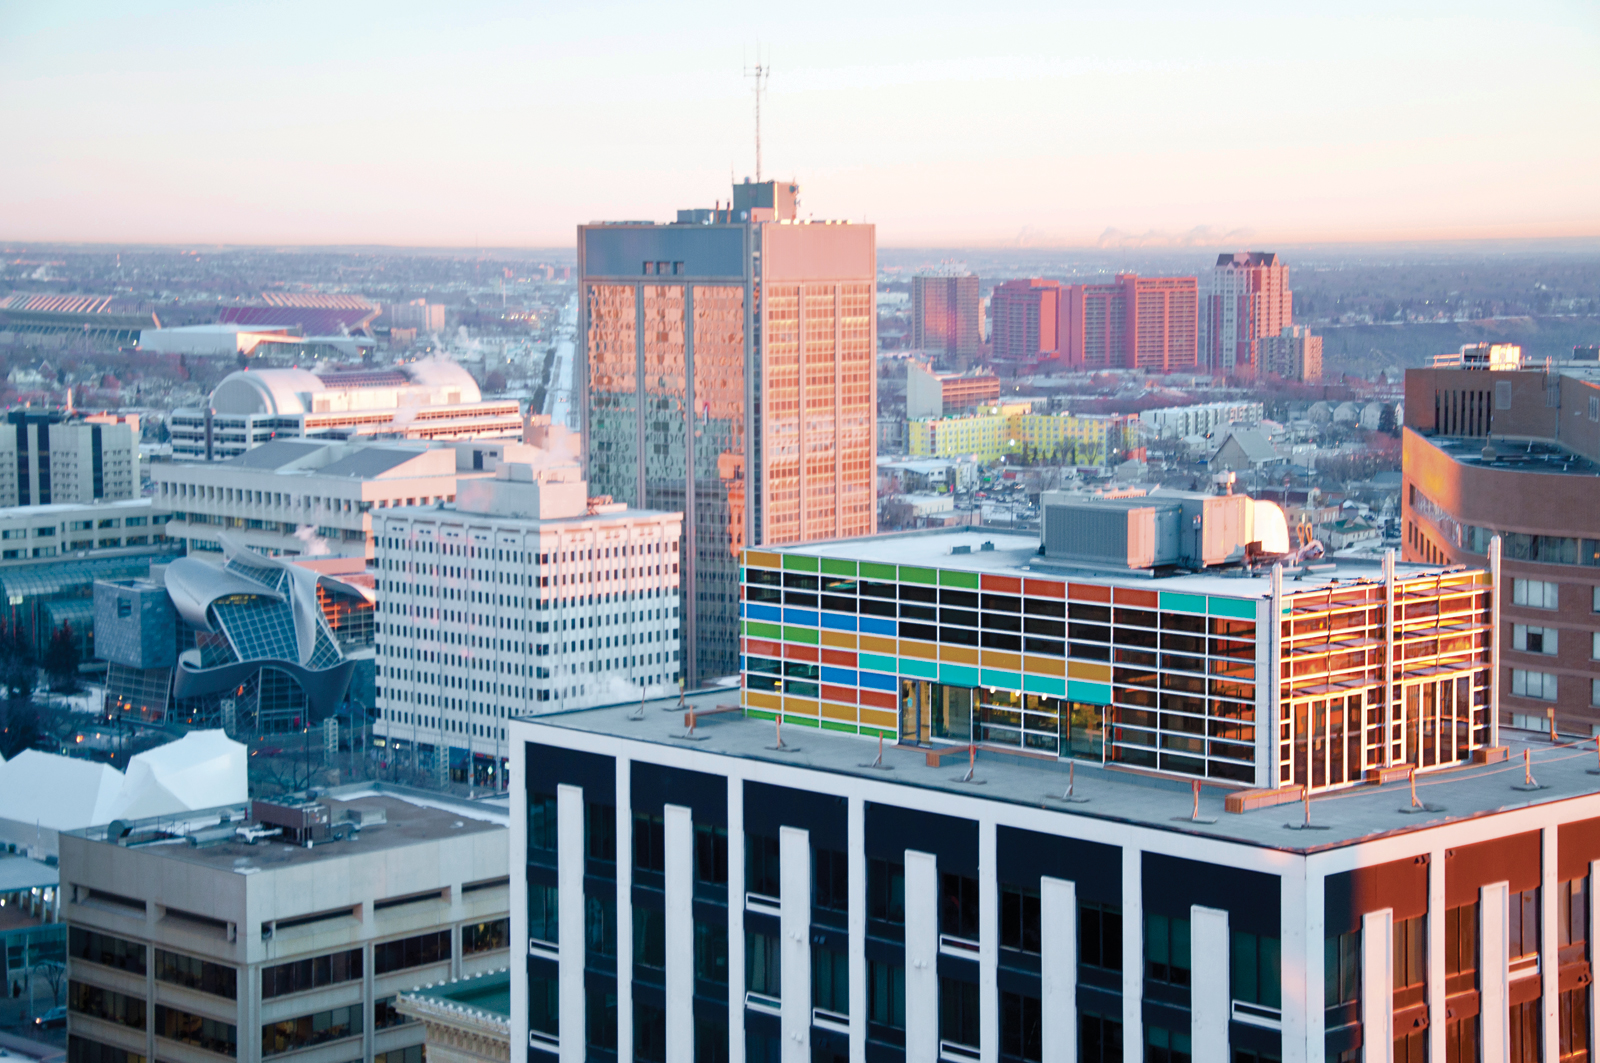 Aerial view of the Cambridge Lofts Penthouse in Edmonton, Alberta